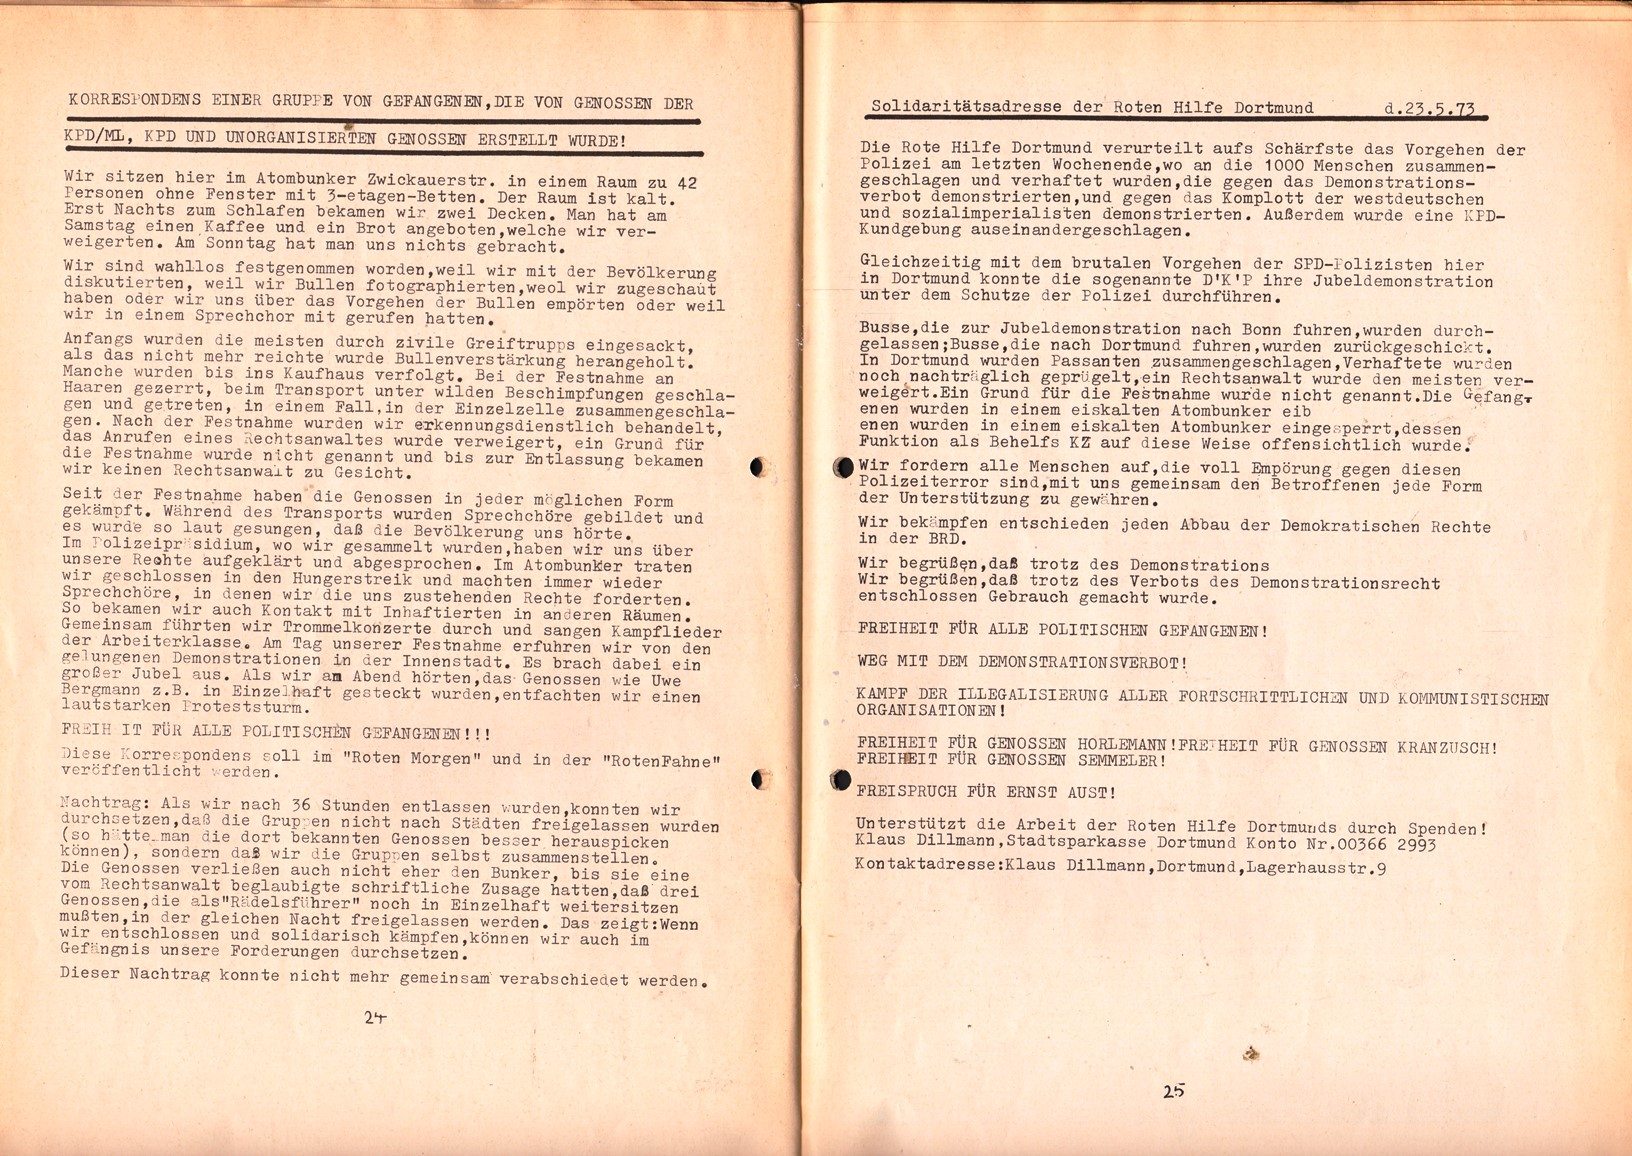 KPDML_1973_Breschnew_Besuch_in_Bonn_13